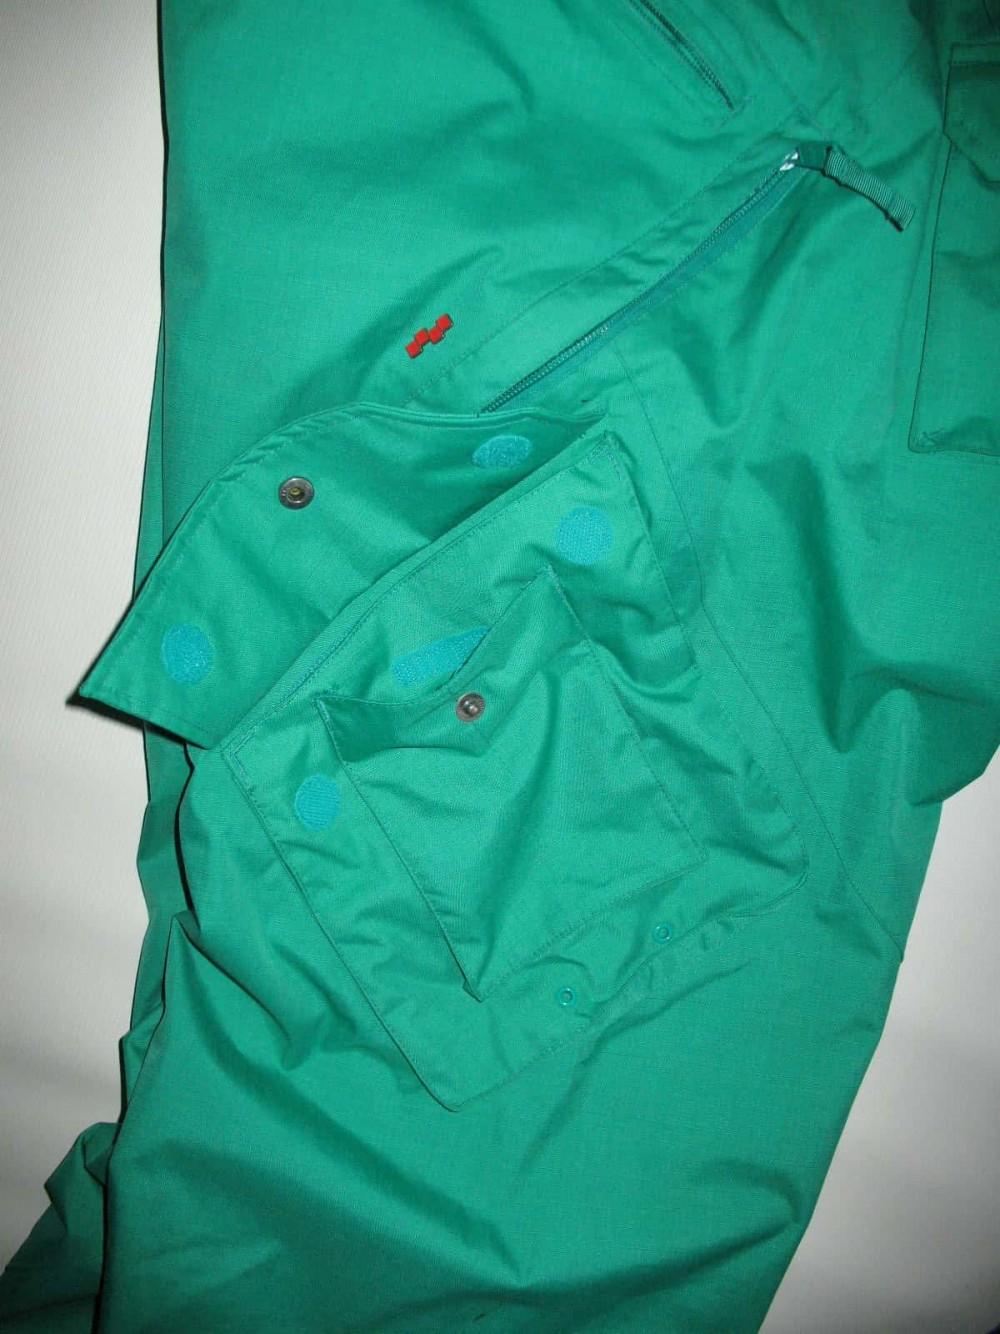 Штаны FOURSQUARE q snowboard pants (размер XL) - 10